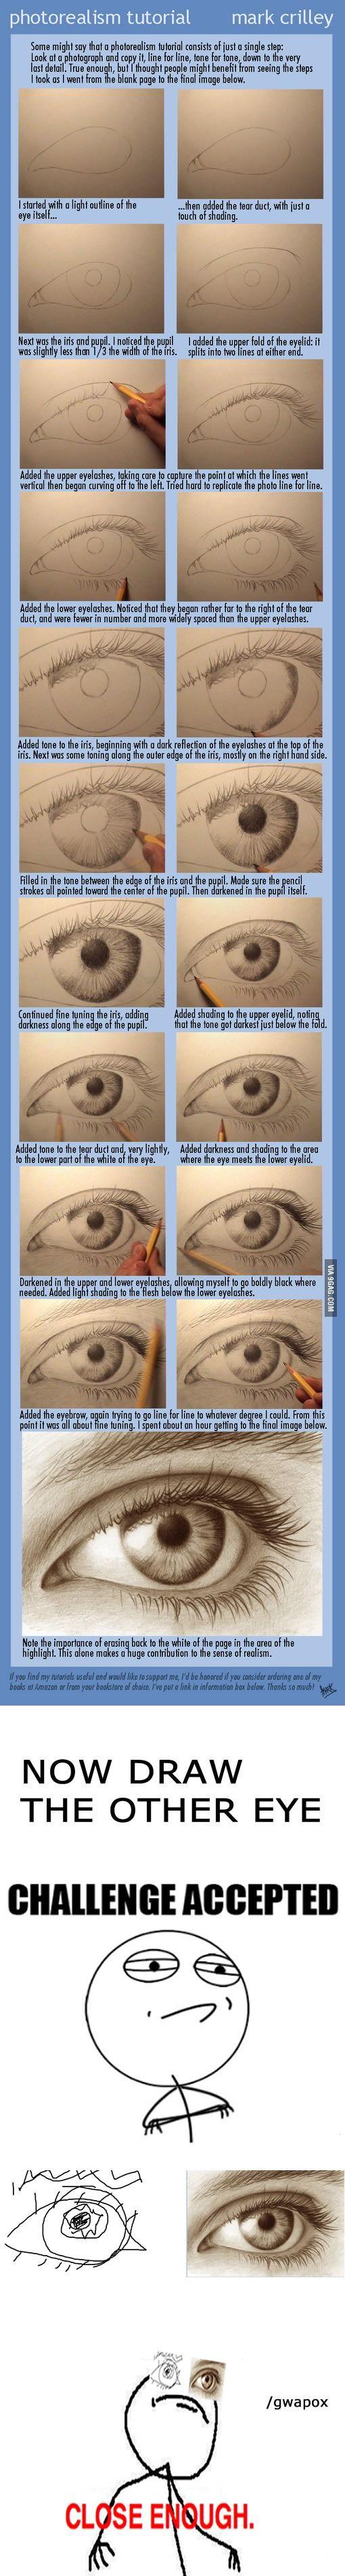 Drawing eyes step by step